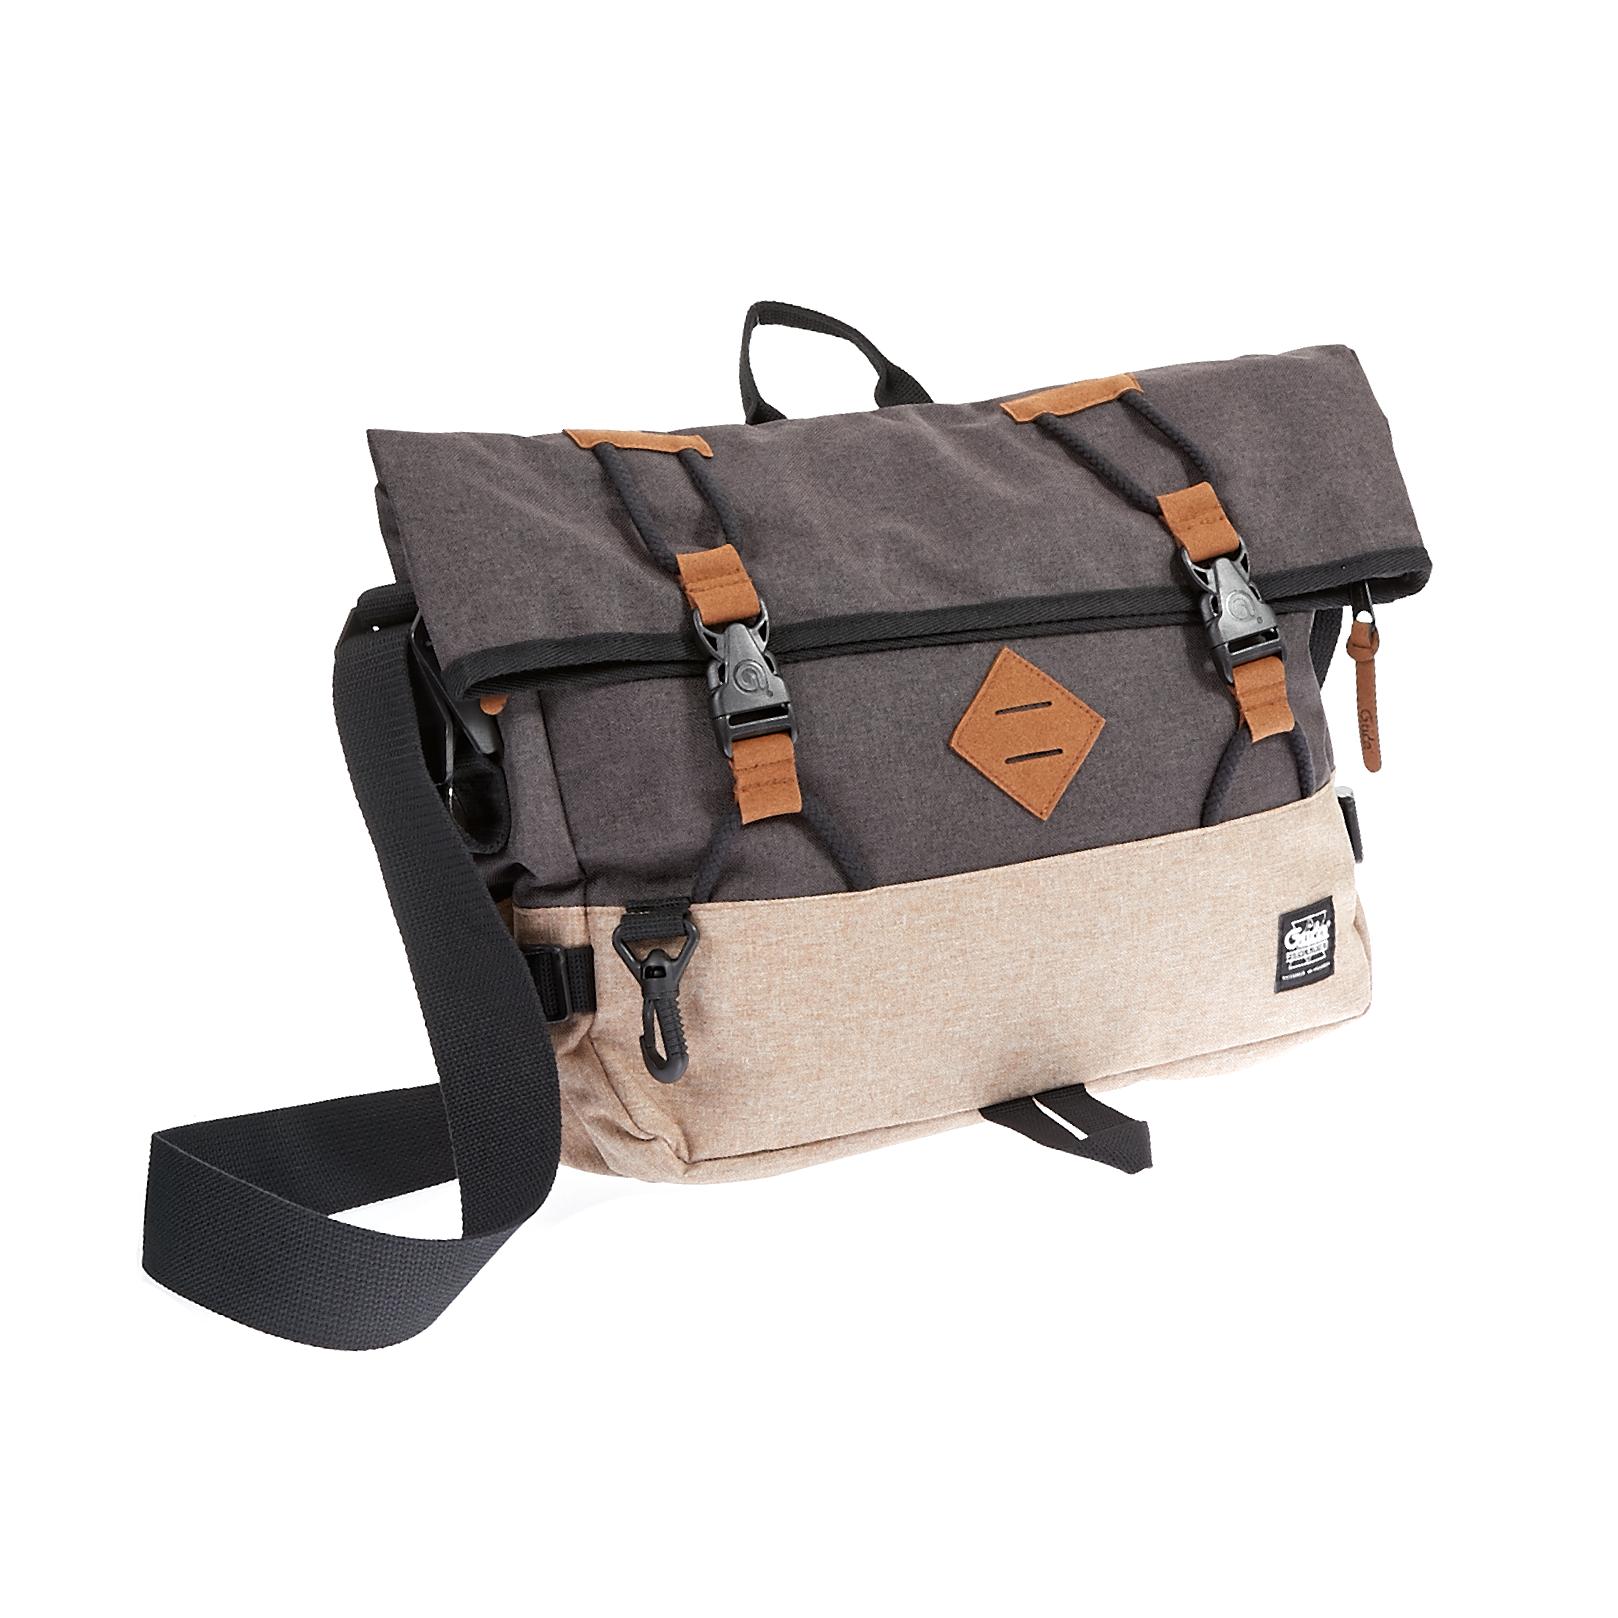 G.RIDE – Τσάντα ταχυδρόμου G.Ride μπεζ-καφέ 1533187.0-K471